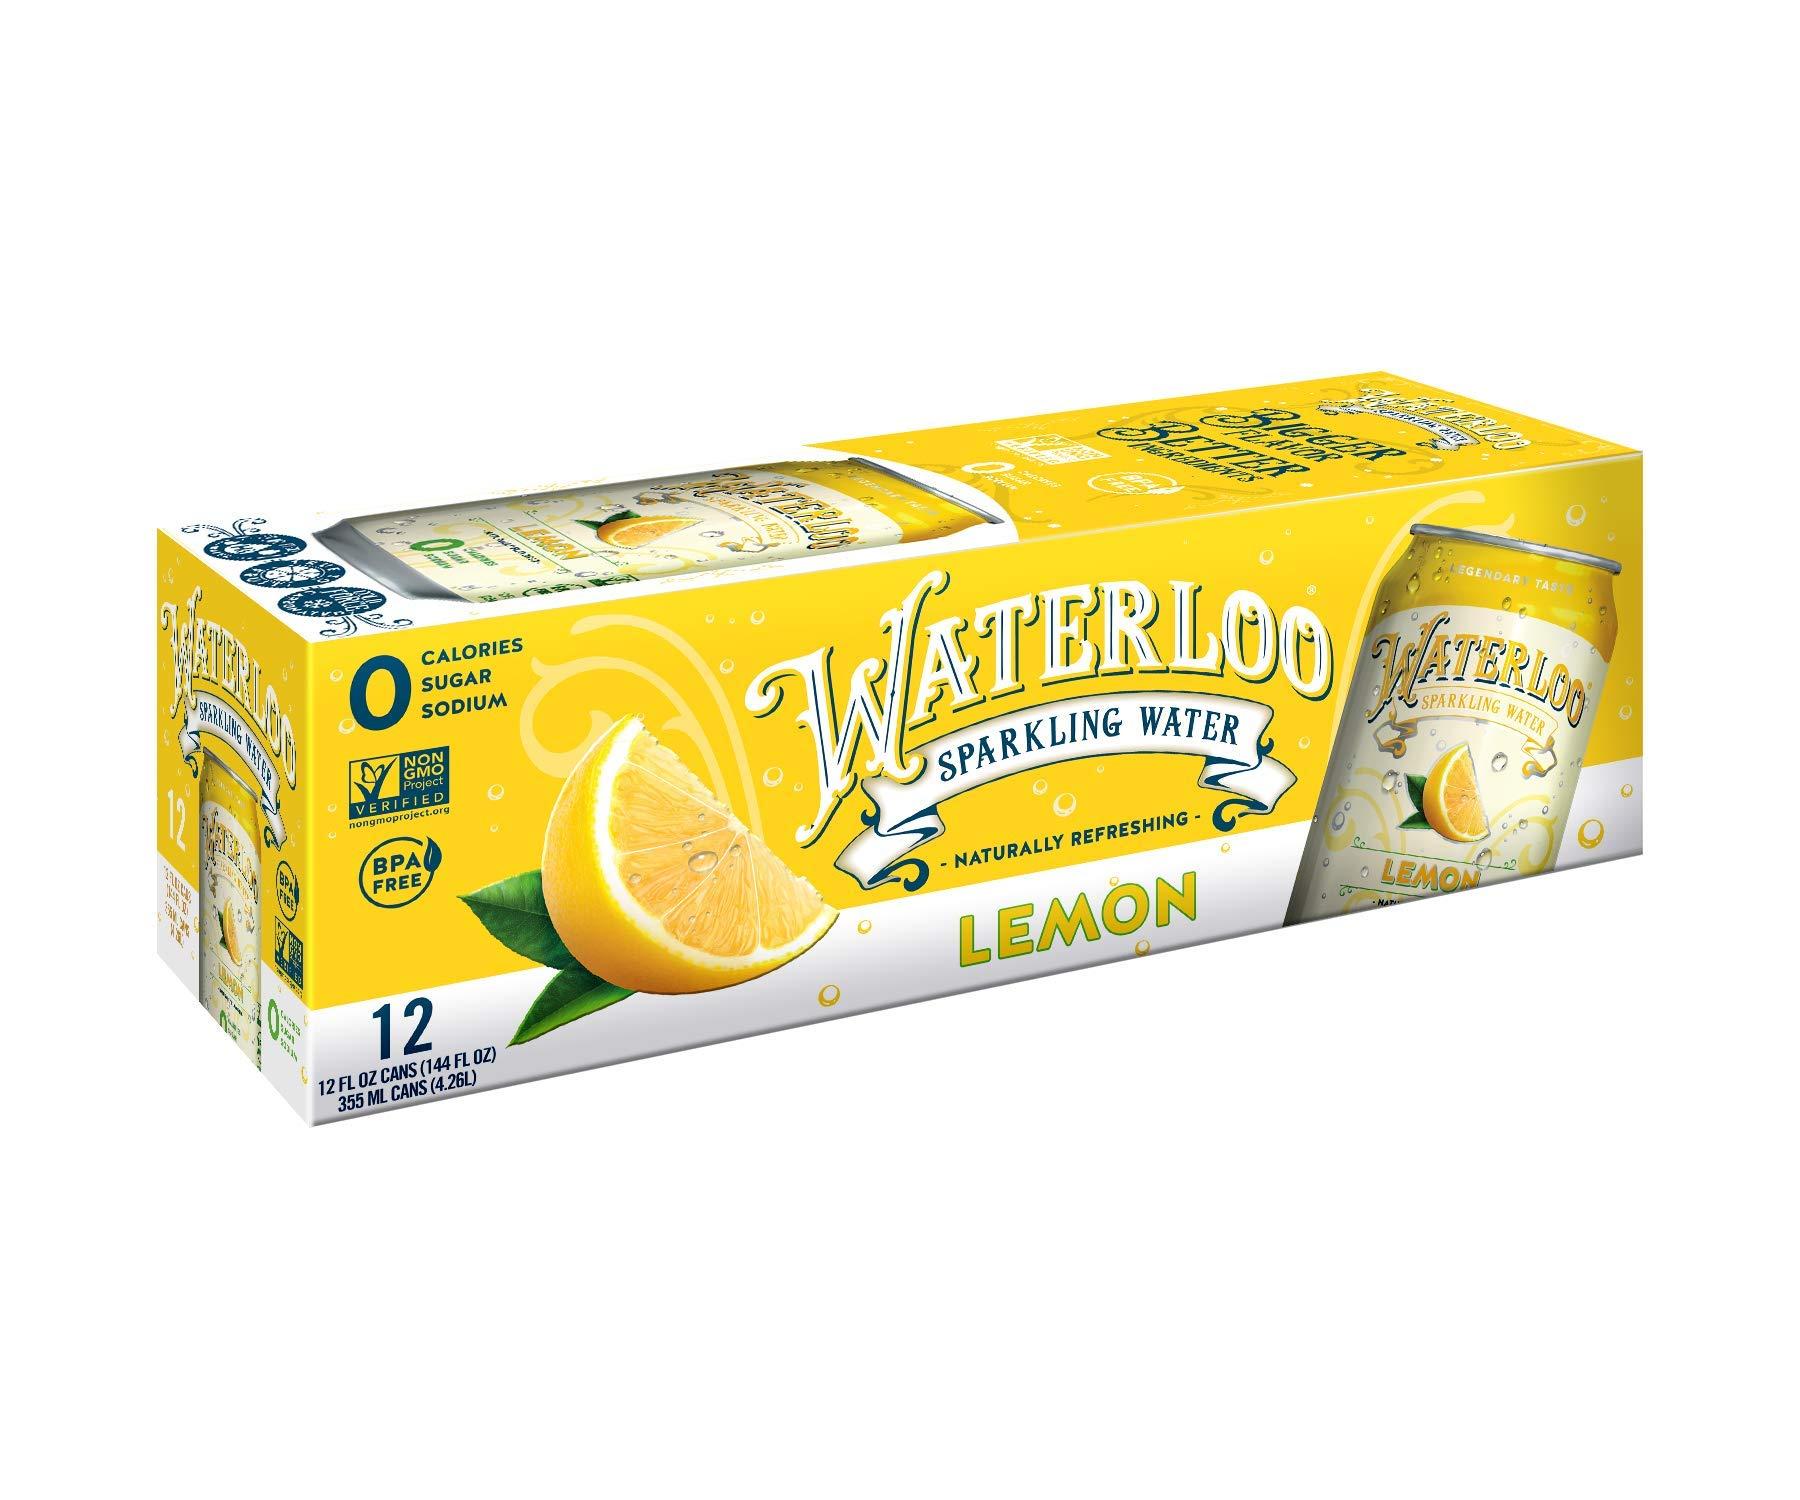 Waterloo Sparkling Water Lemon Flavor Zero Calorie No Sugar 12oz Cans (Pack of 12), Fruit Flavored Sparkling Water, Naturally Flavored, Zero Calories, Zero Sugar, Zero Sodium